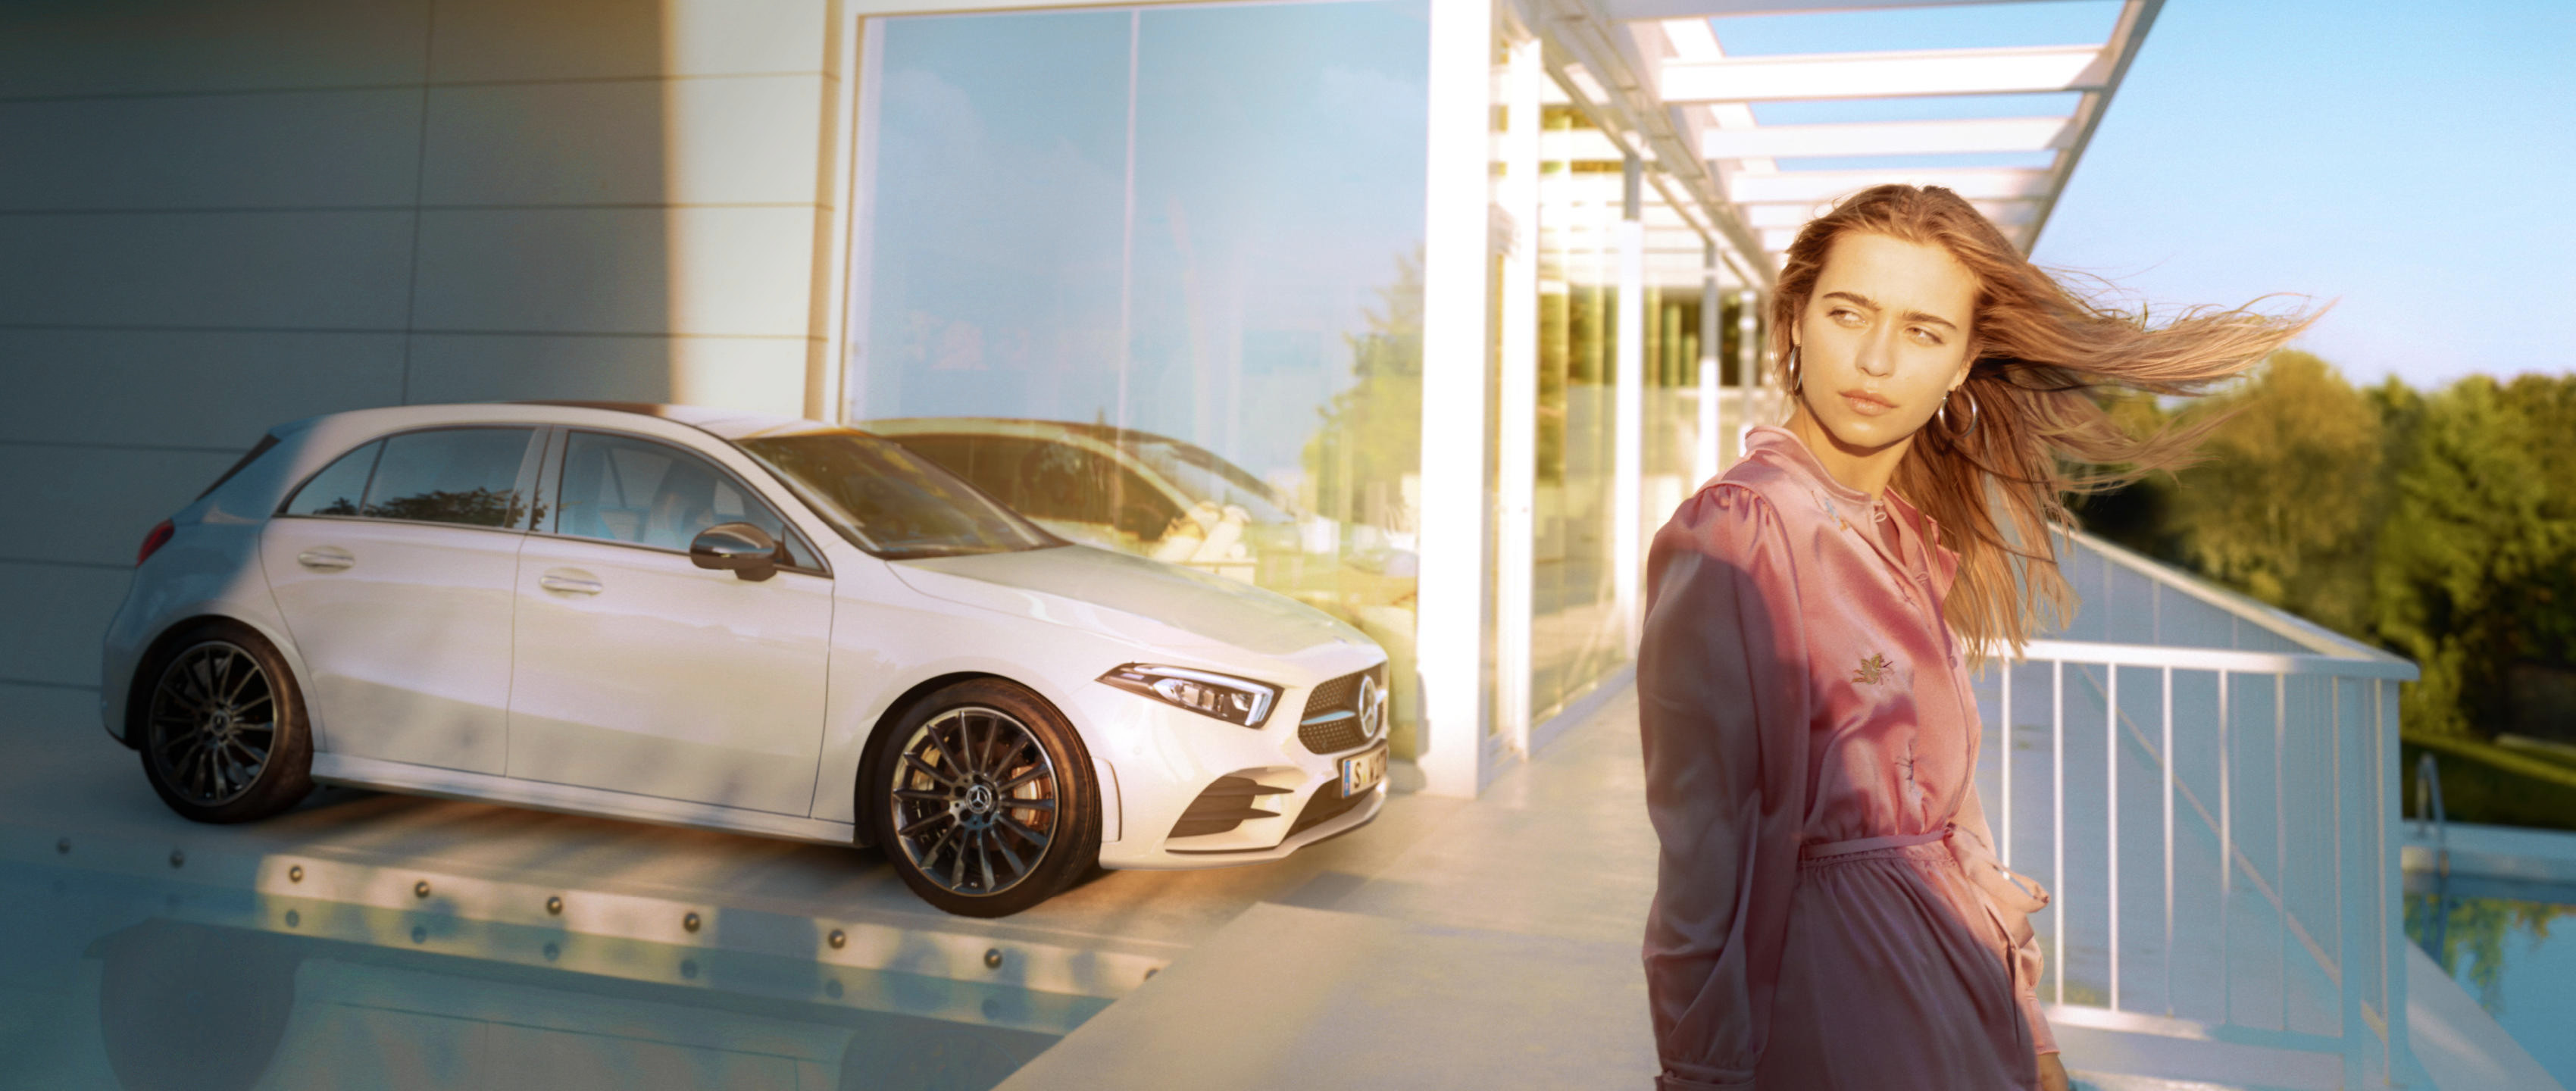 Mercedes-Benz запустили нову рекламну кампанію з Нікі Мінаж для A-Class